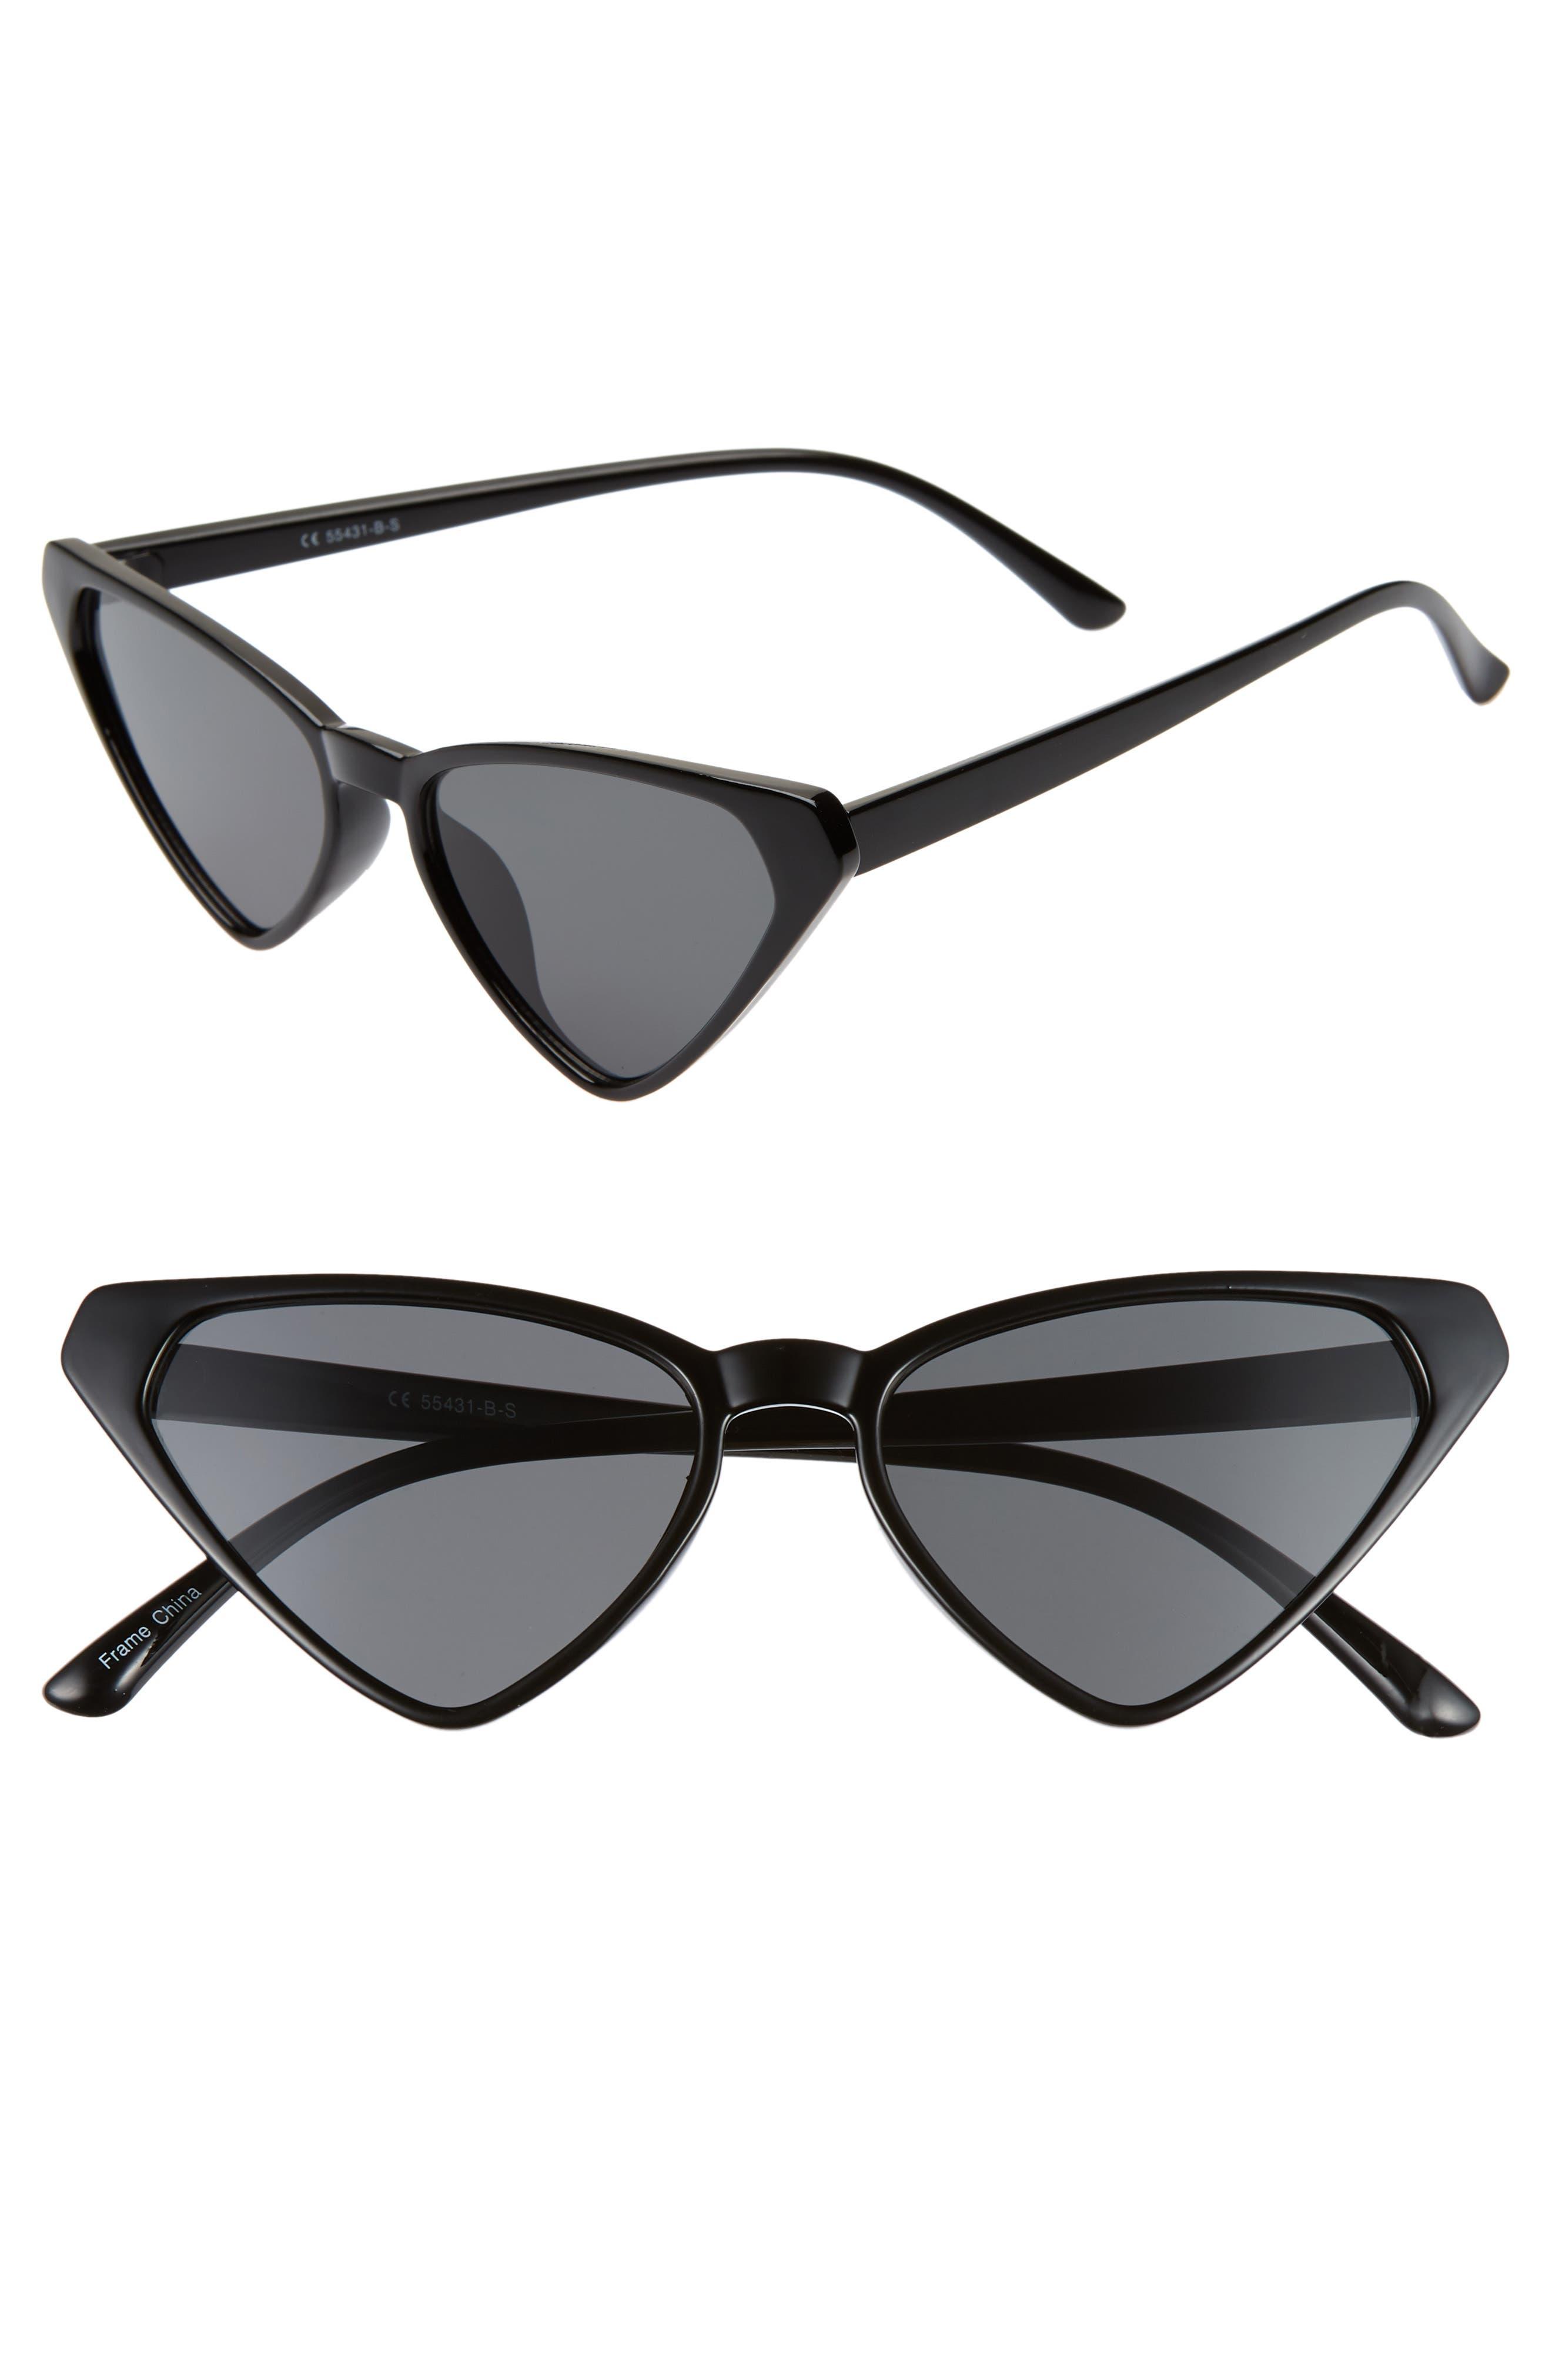 54mm Angular Cat Eye Sunglasses,                             Main thumbnail 1, color,                             BLACK